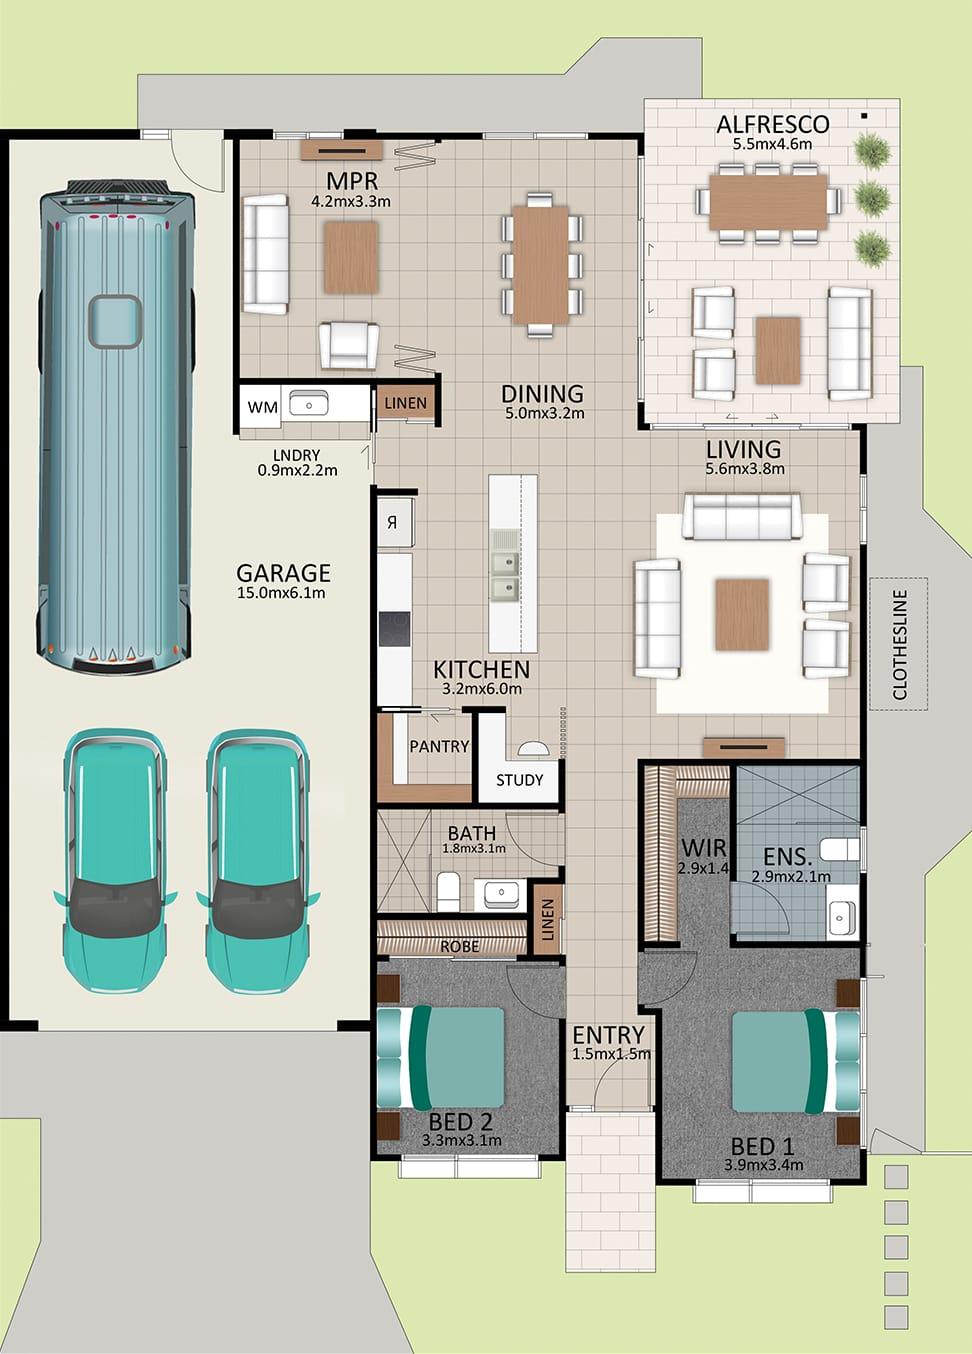 LR WEB LAT25 Floorplan LOT 178 Pepper NOV19 V1 - Lot 178